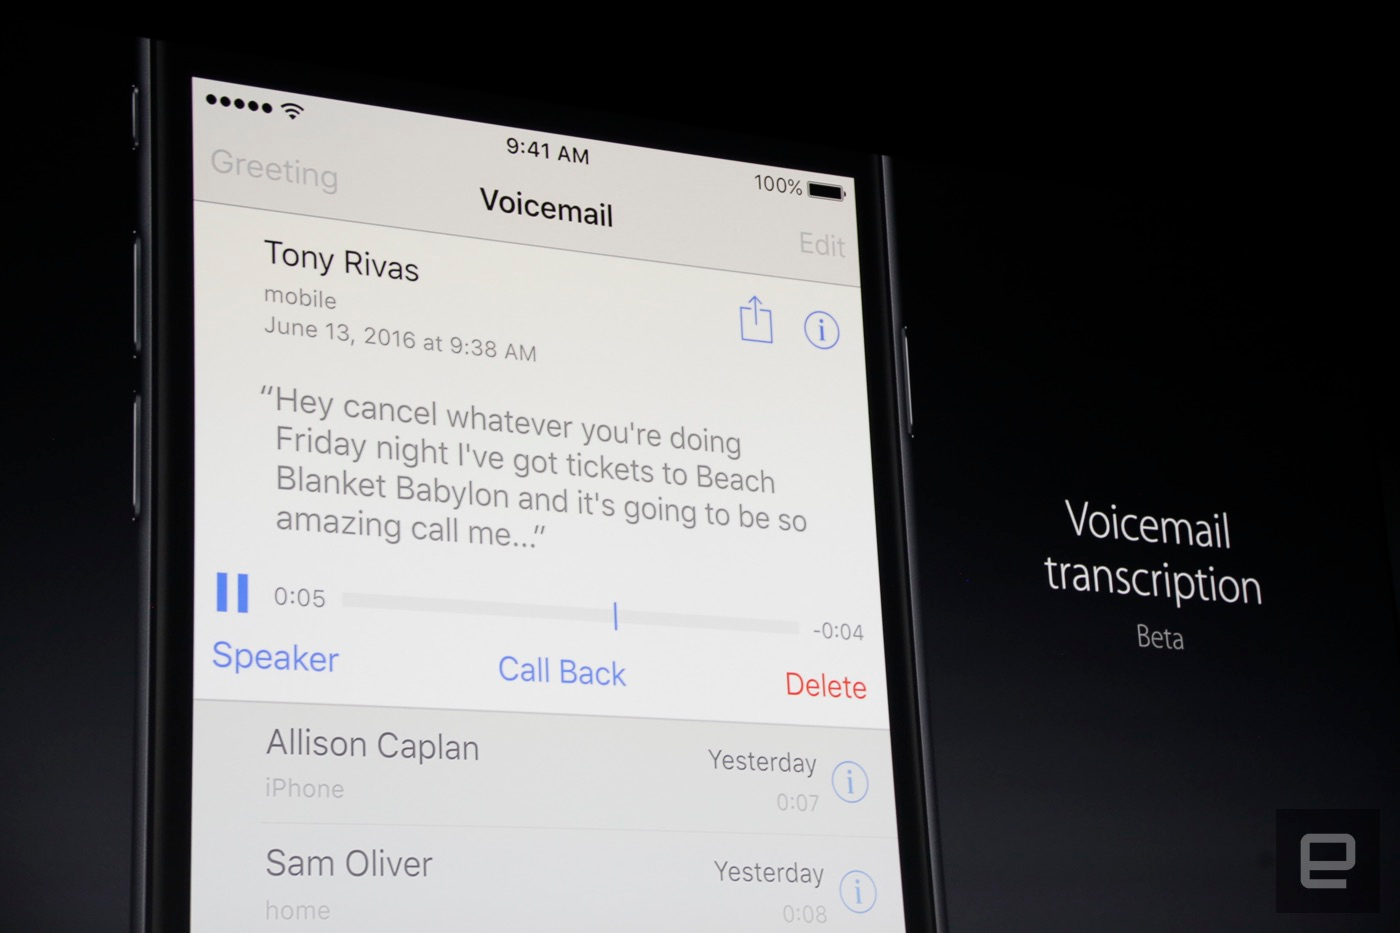 New Features Of iOS 10, iOS 10 Upgrade, Apple Maps, Siri